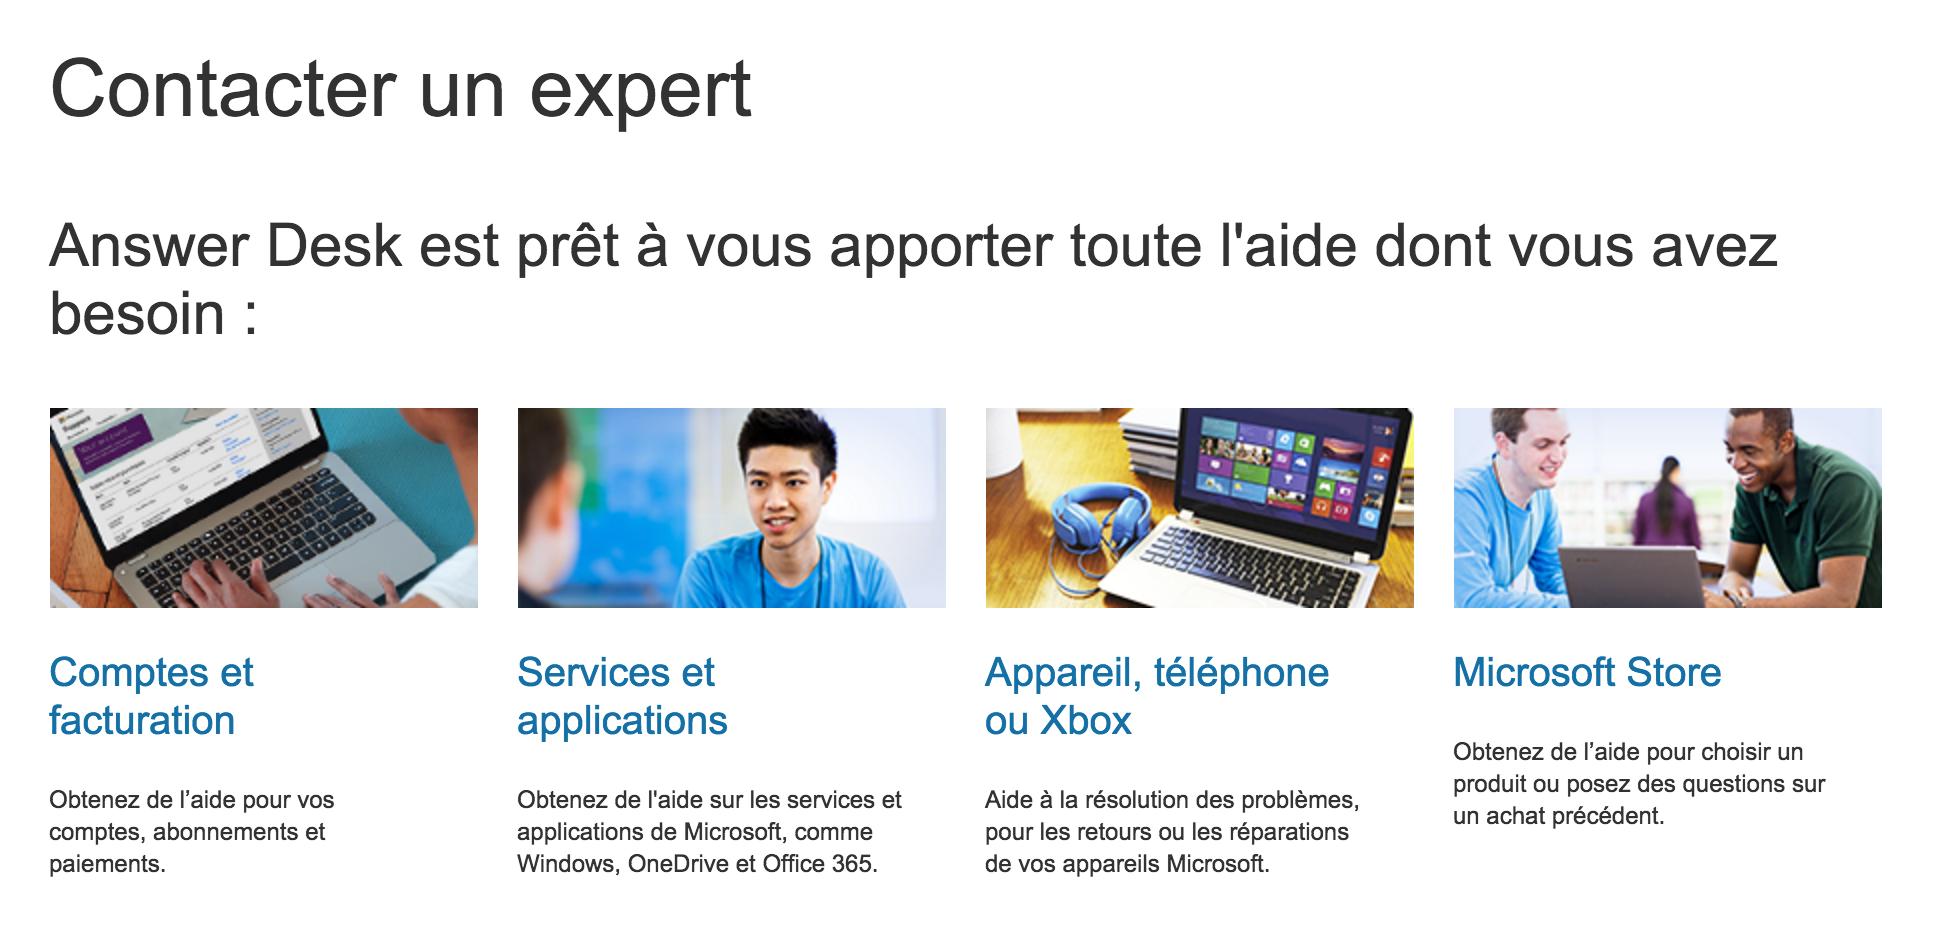 Aperçu de la page d'aide Microsoft